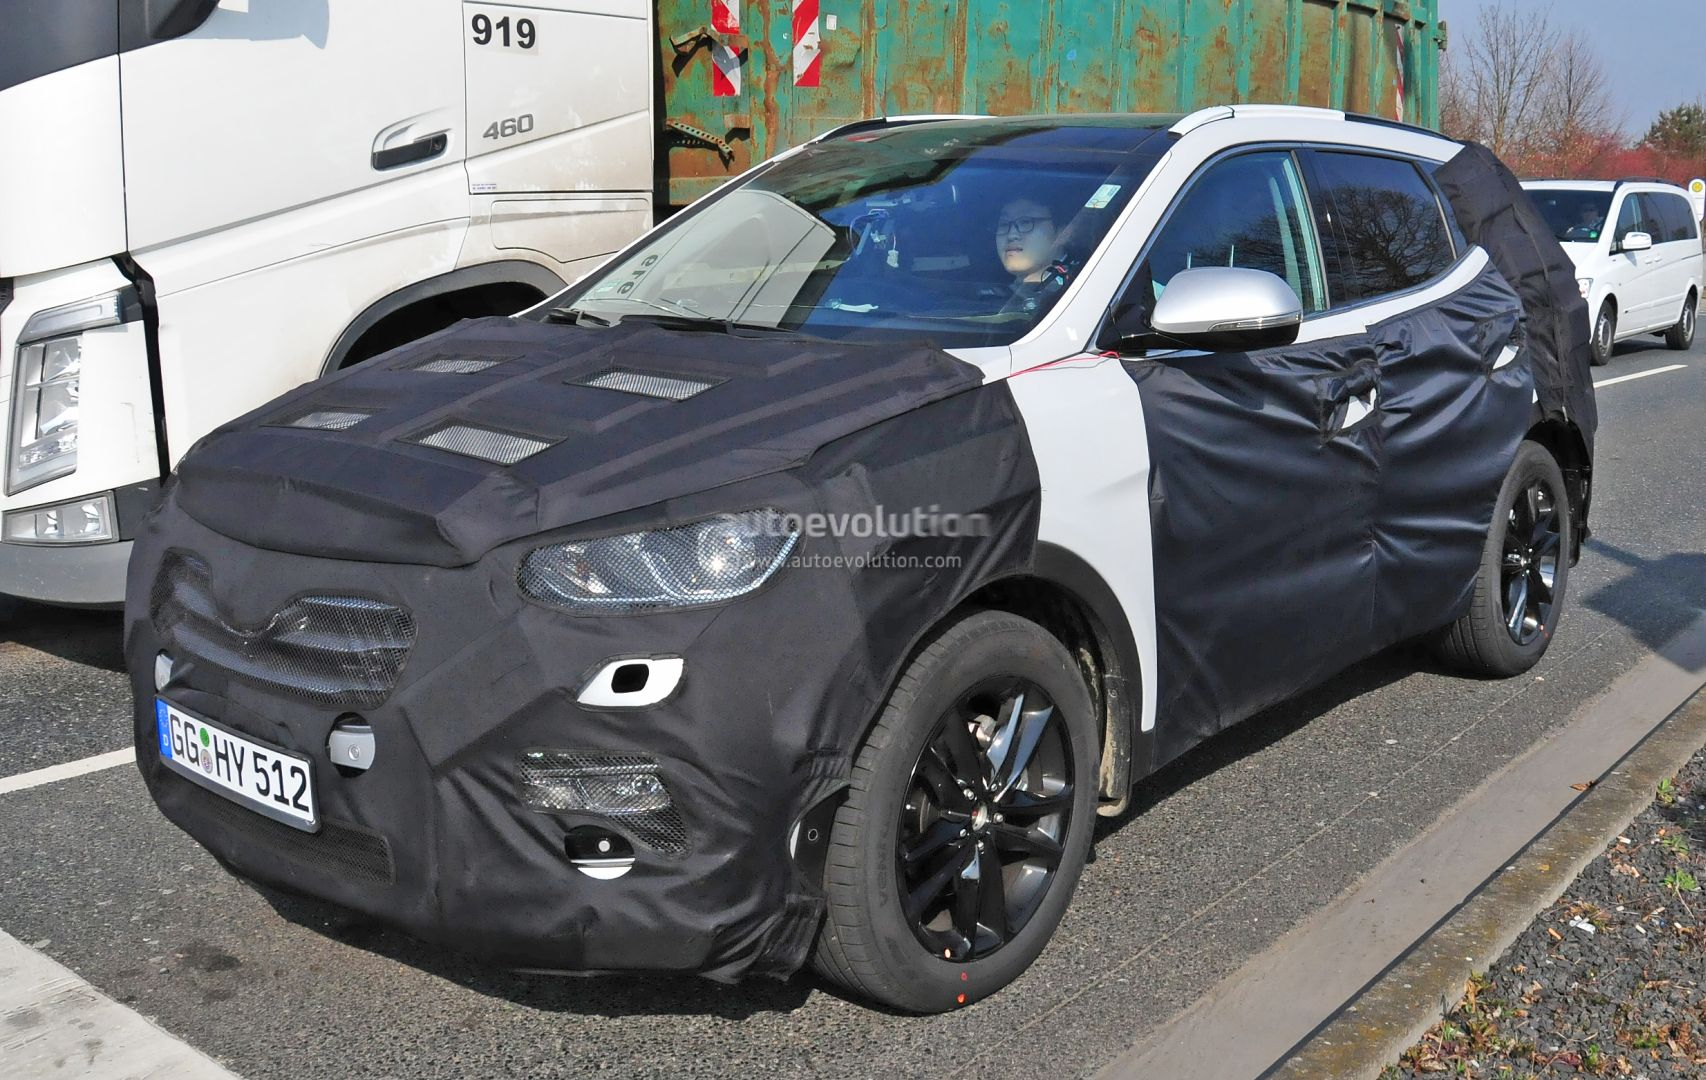 2017 Hyundai Santa Fe Facelift Spyshots Show New Lights